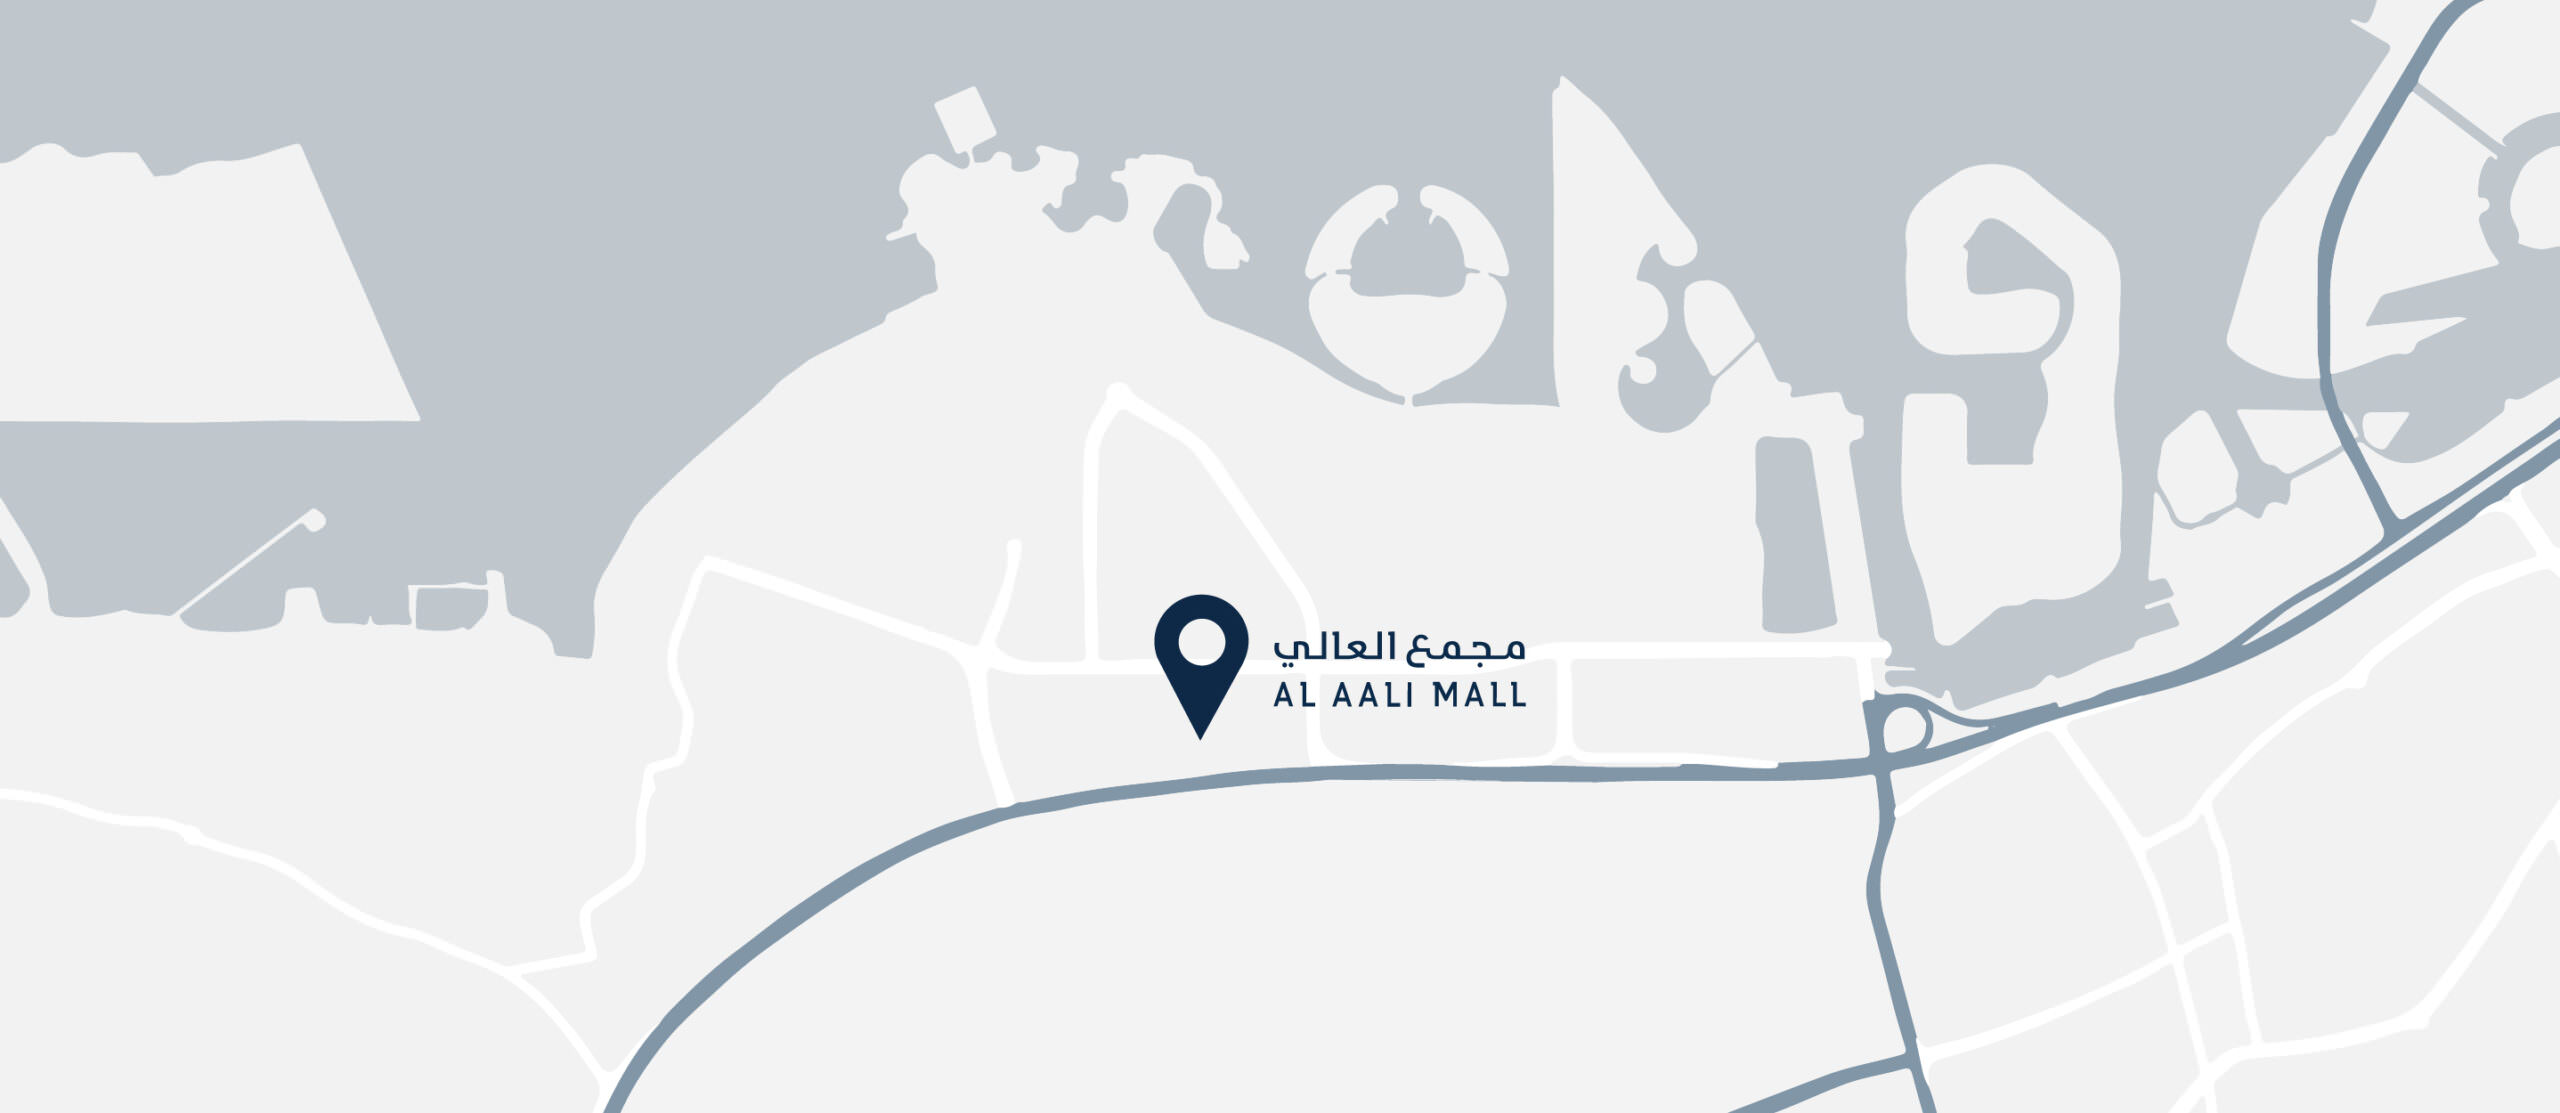 Al aali Mall Location on Google Map